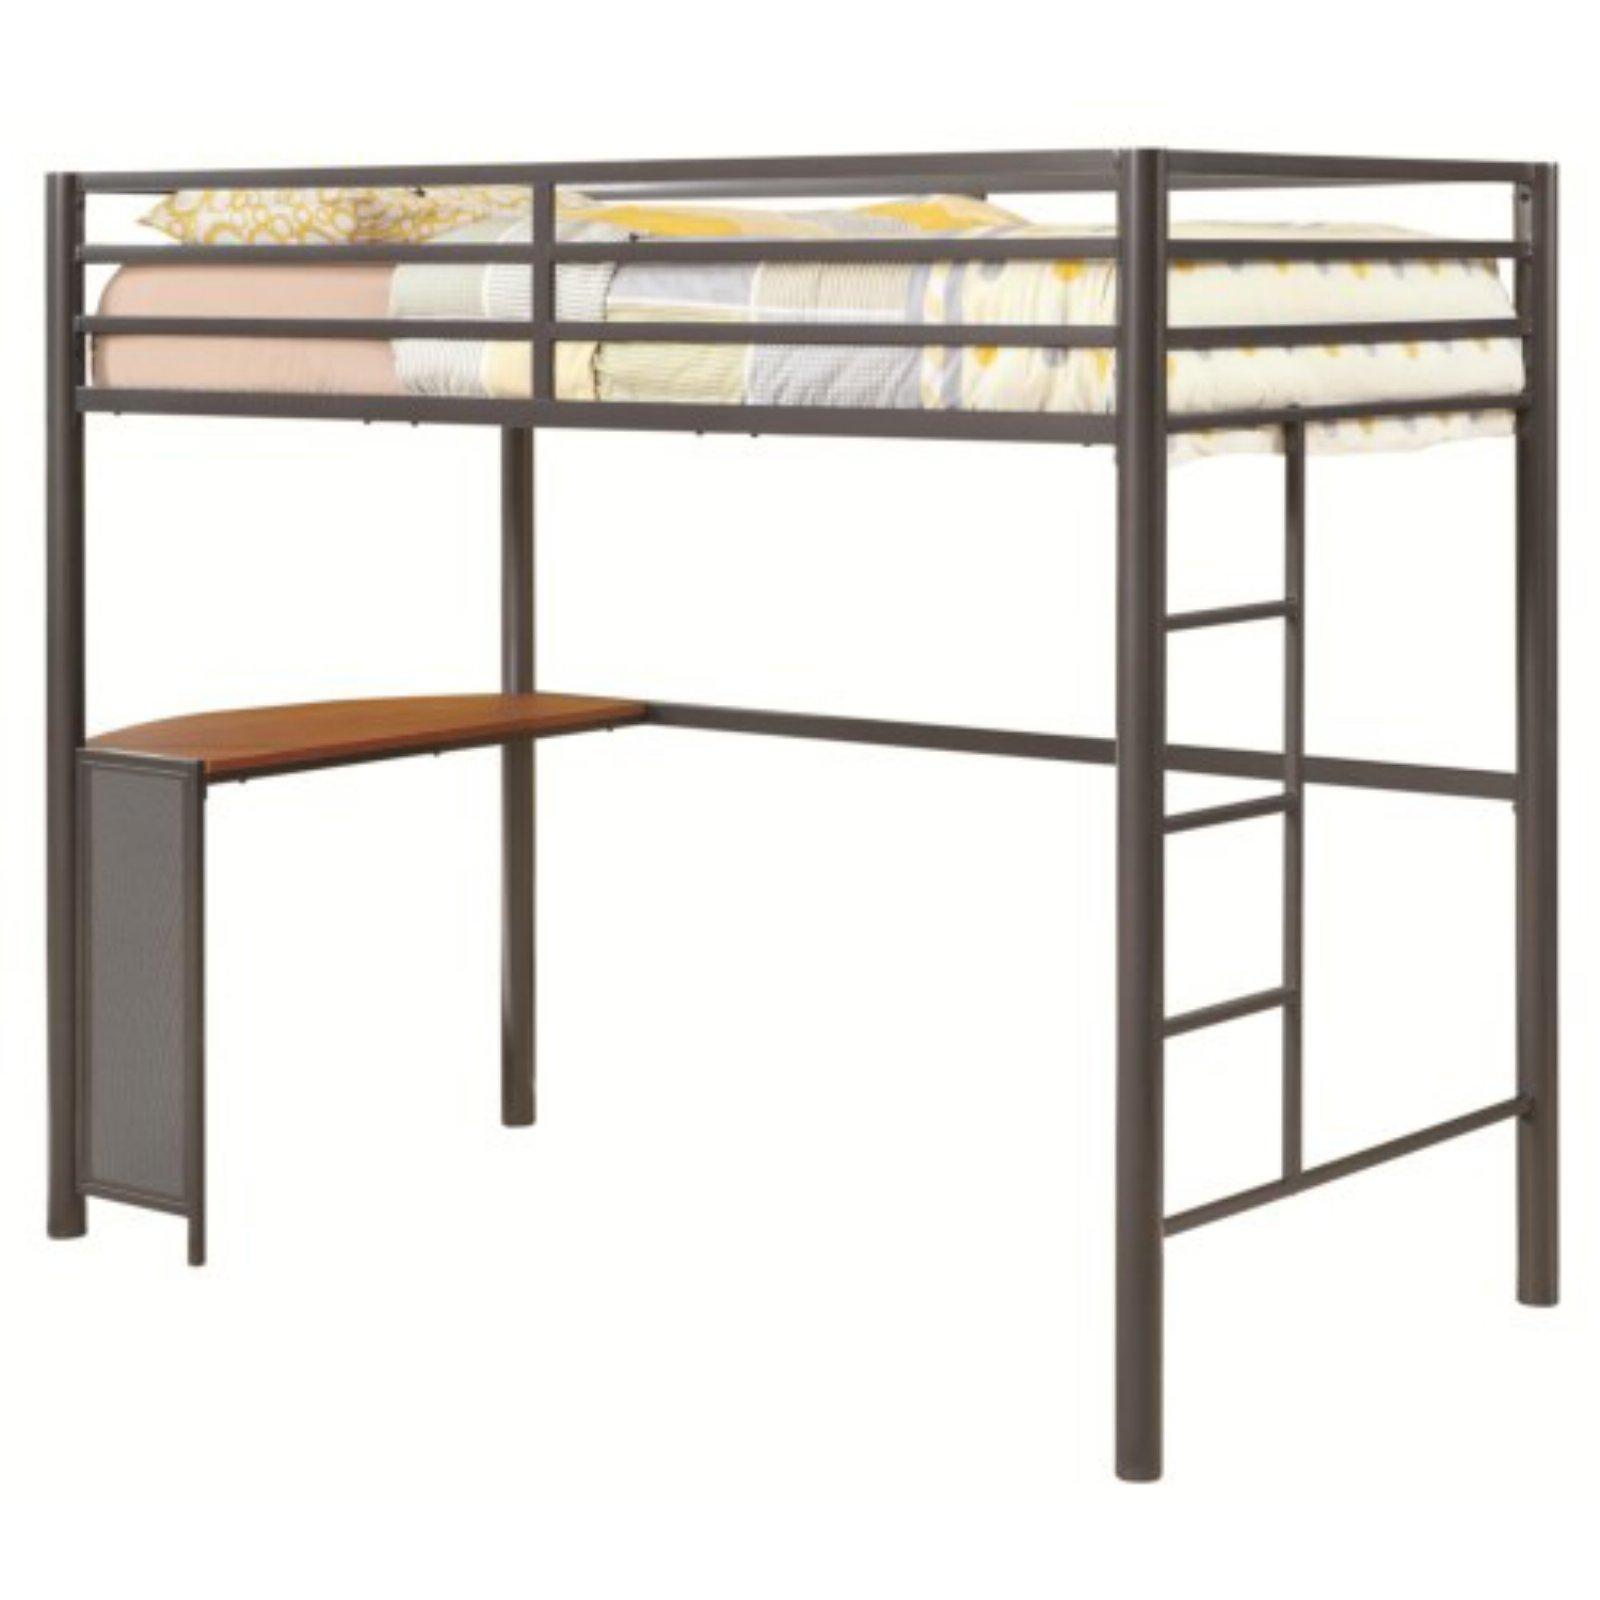 Coaster Furniture Bunks Twin Metal Workstation Loft Bed - Dark Gun Metal